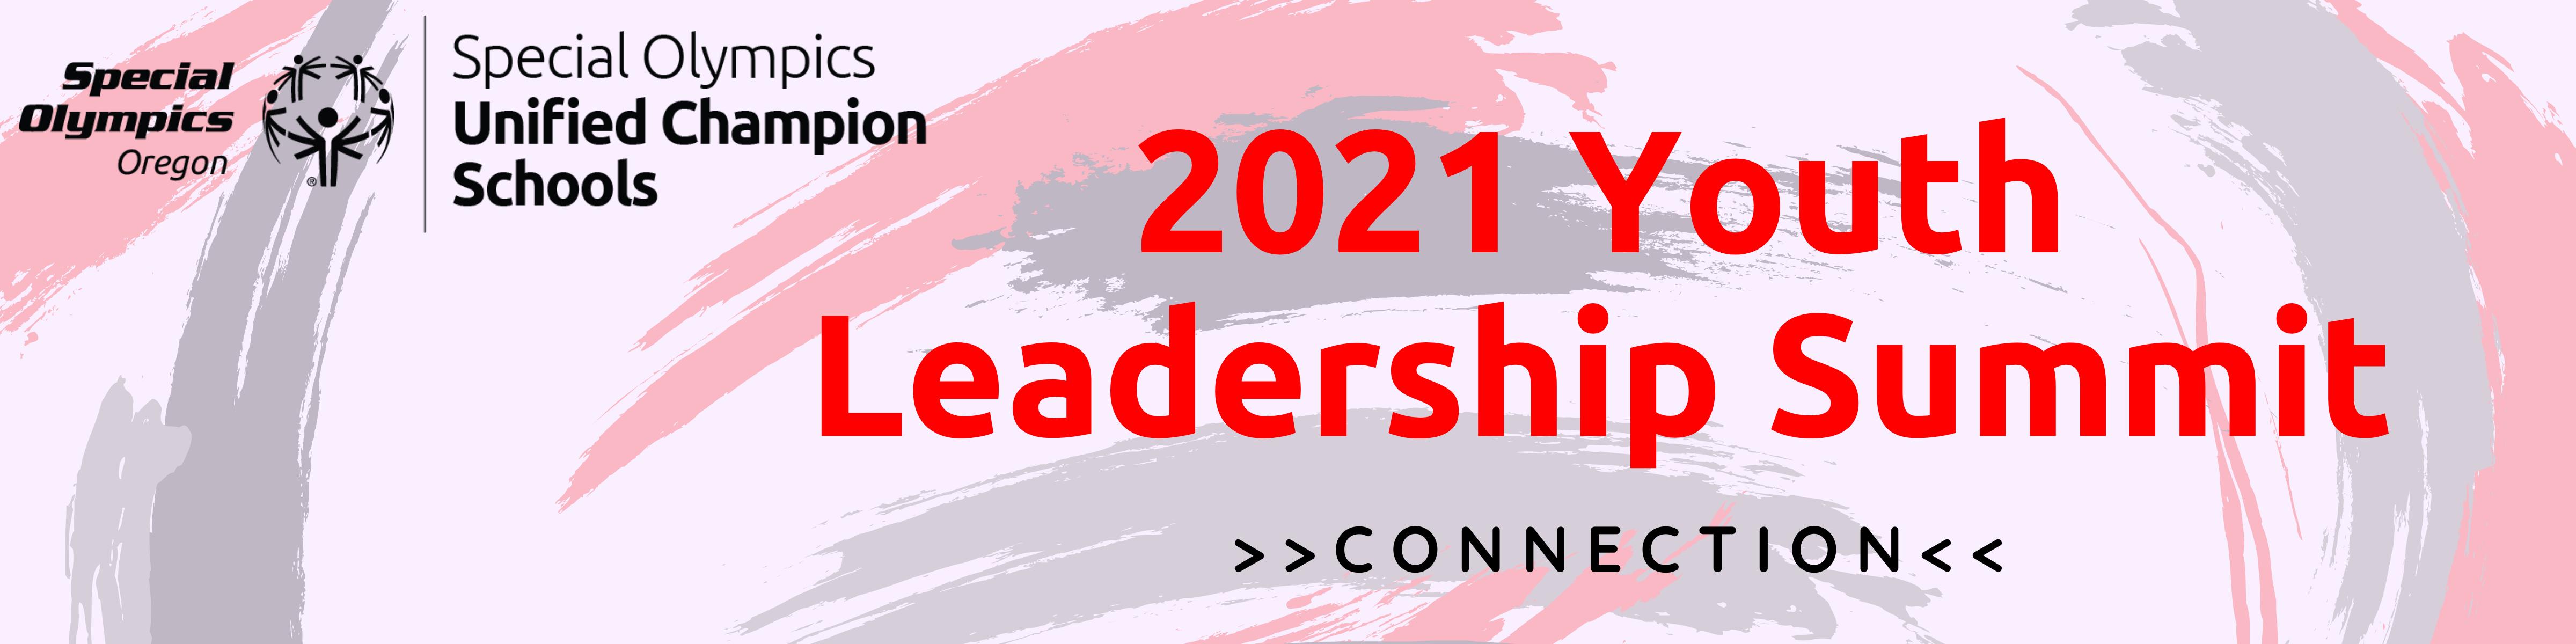 2021 Youth Leadership Summit